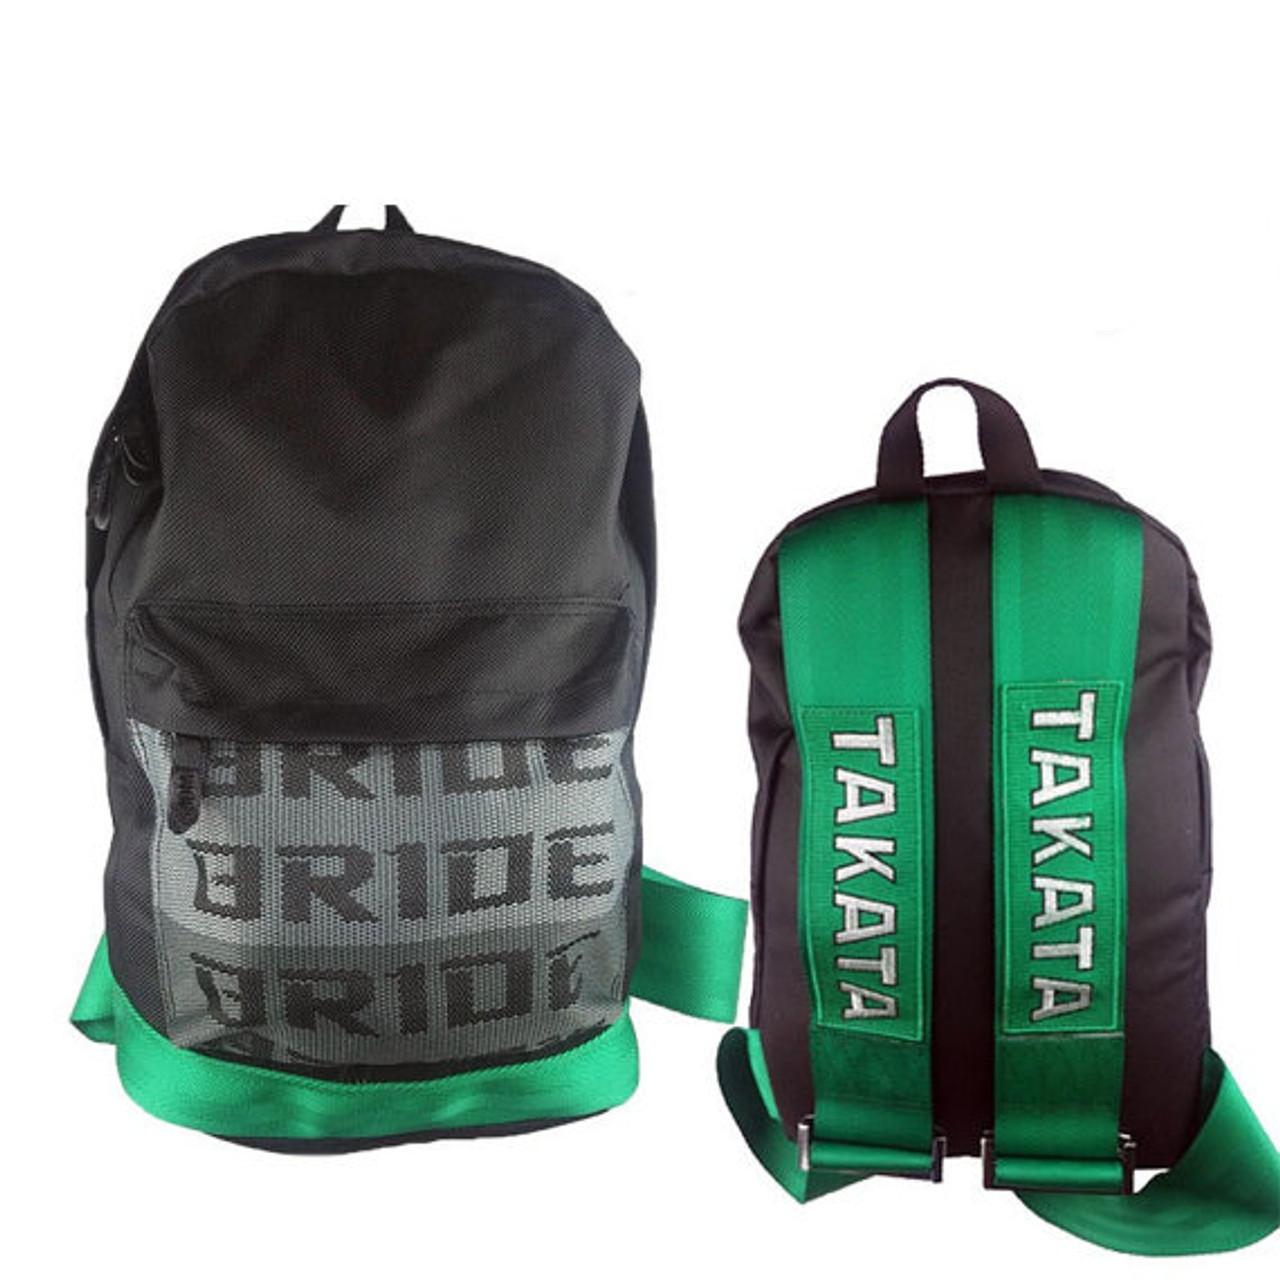 d55422ca1f7 Bride Backpack   Green Takata Straps - Karbon Kings Performance